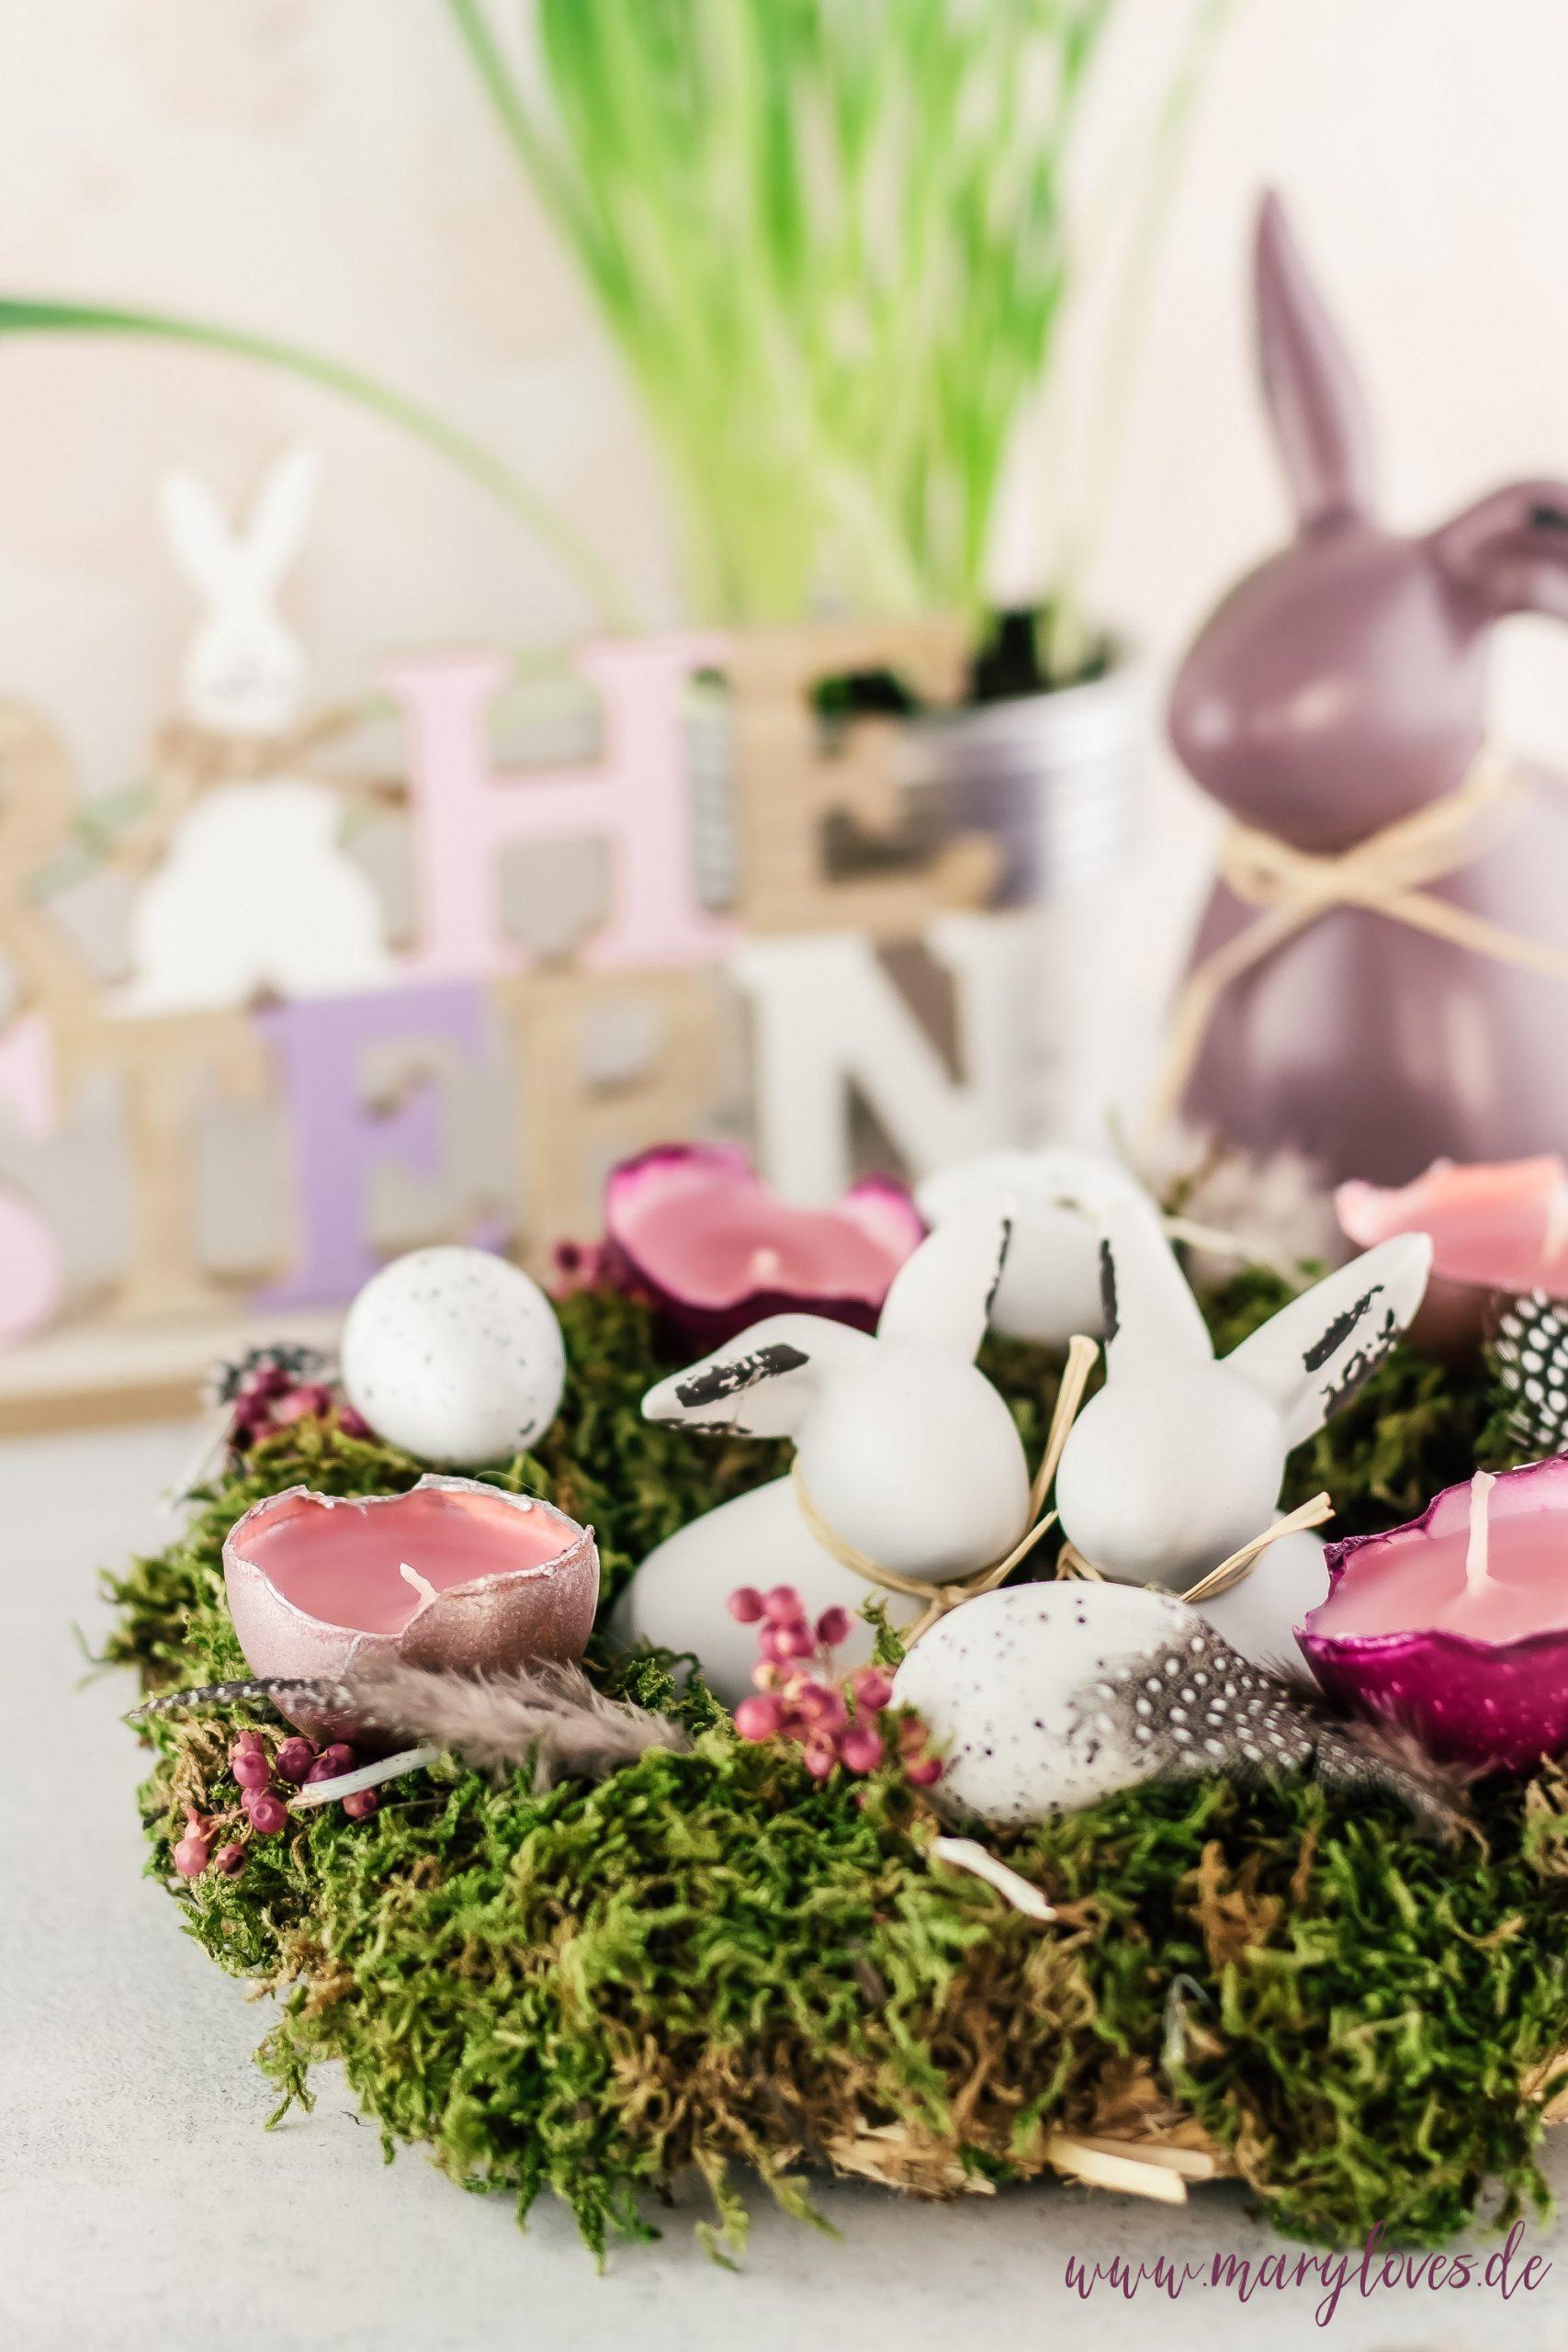 DIY Osterdeko - Osterkranz aus Naturmaterialien selber machen